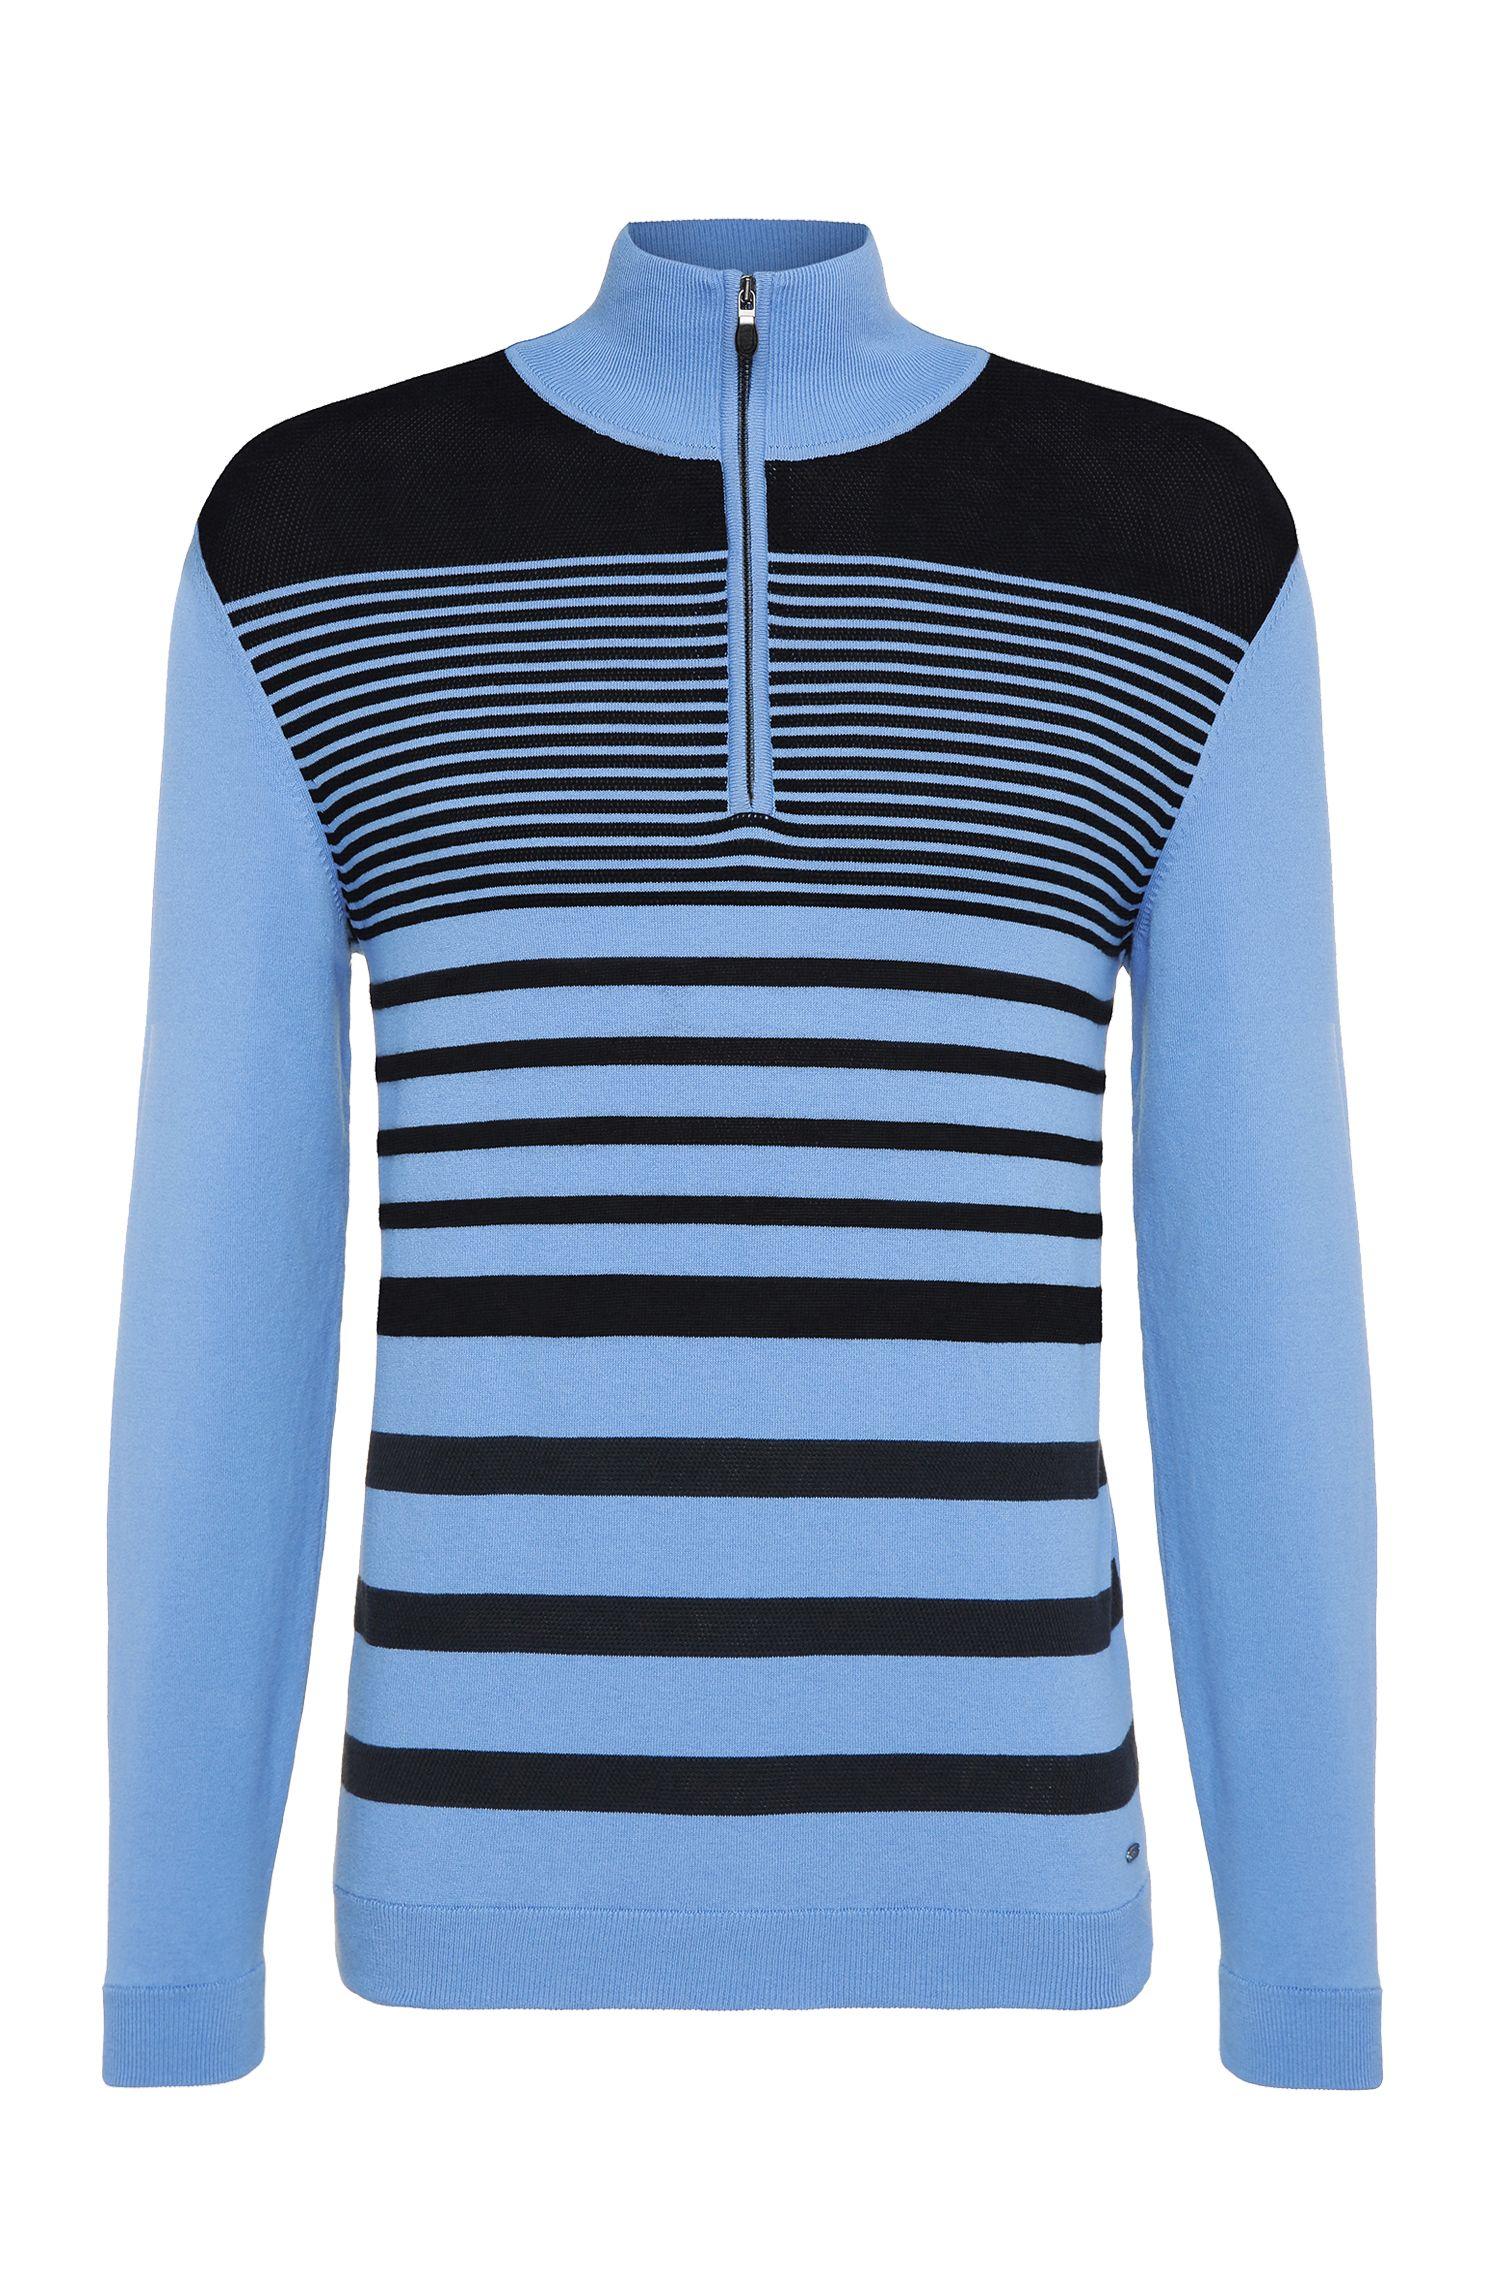 'Zoco' | Slim Fit, Striped Stretch Cotton Half-Zip Sweater